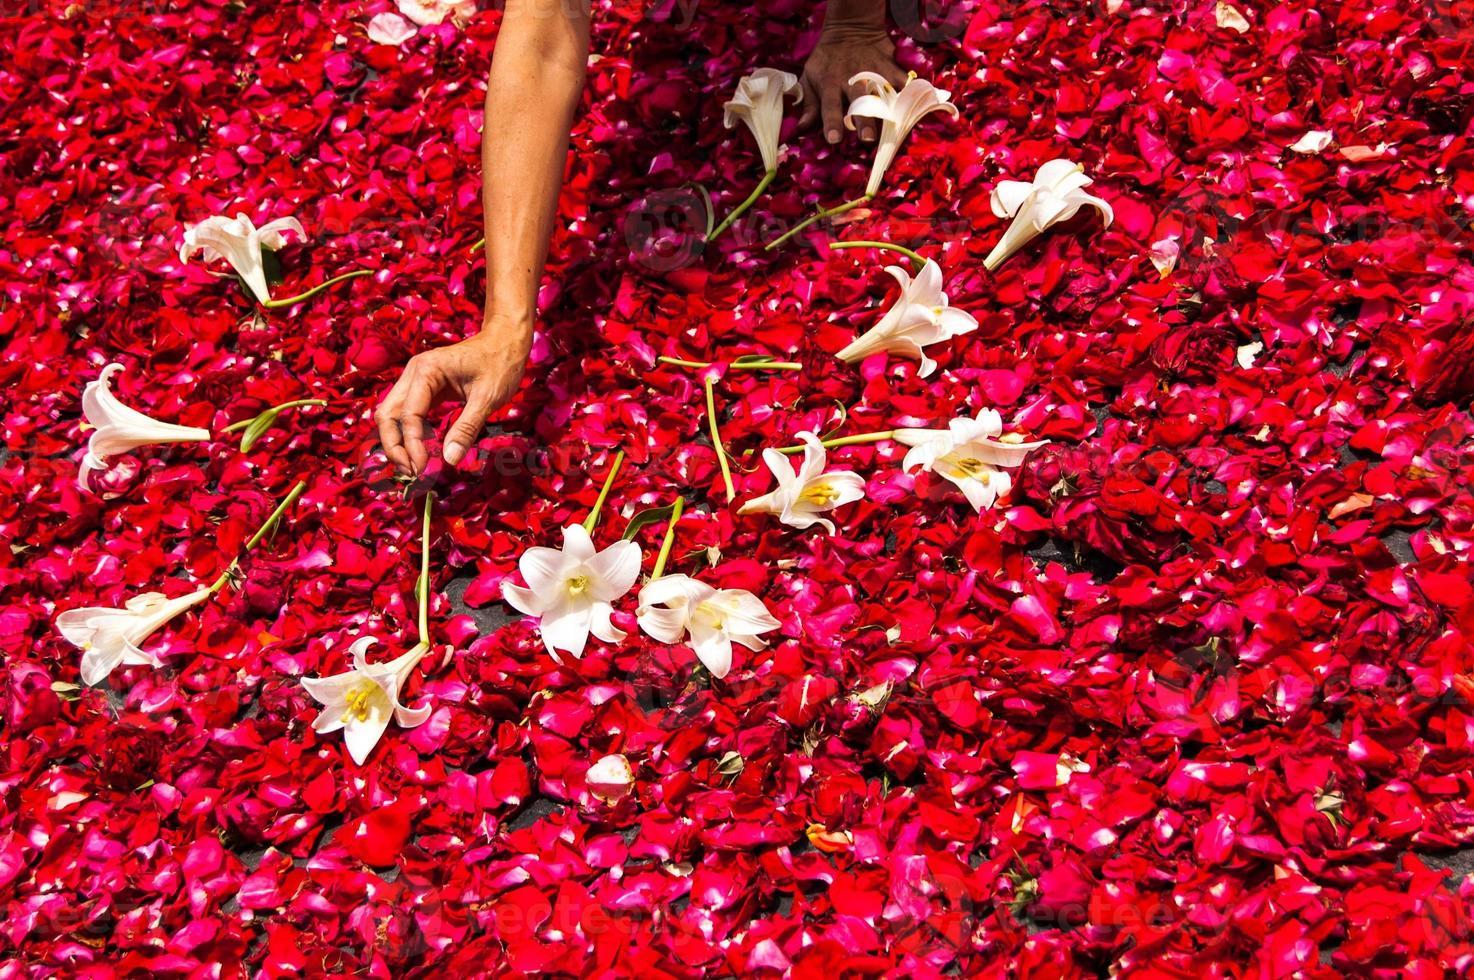 Faire de la Semaine Sainte un tapis de pétales de rose, Antigua, Guatemala photo